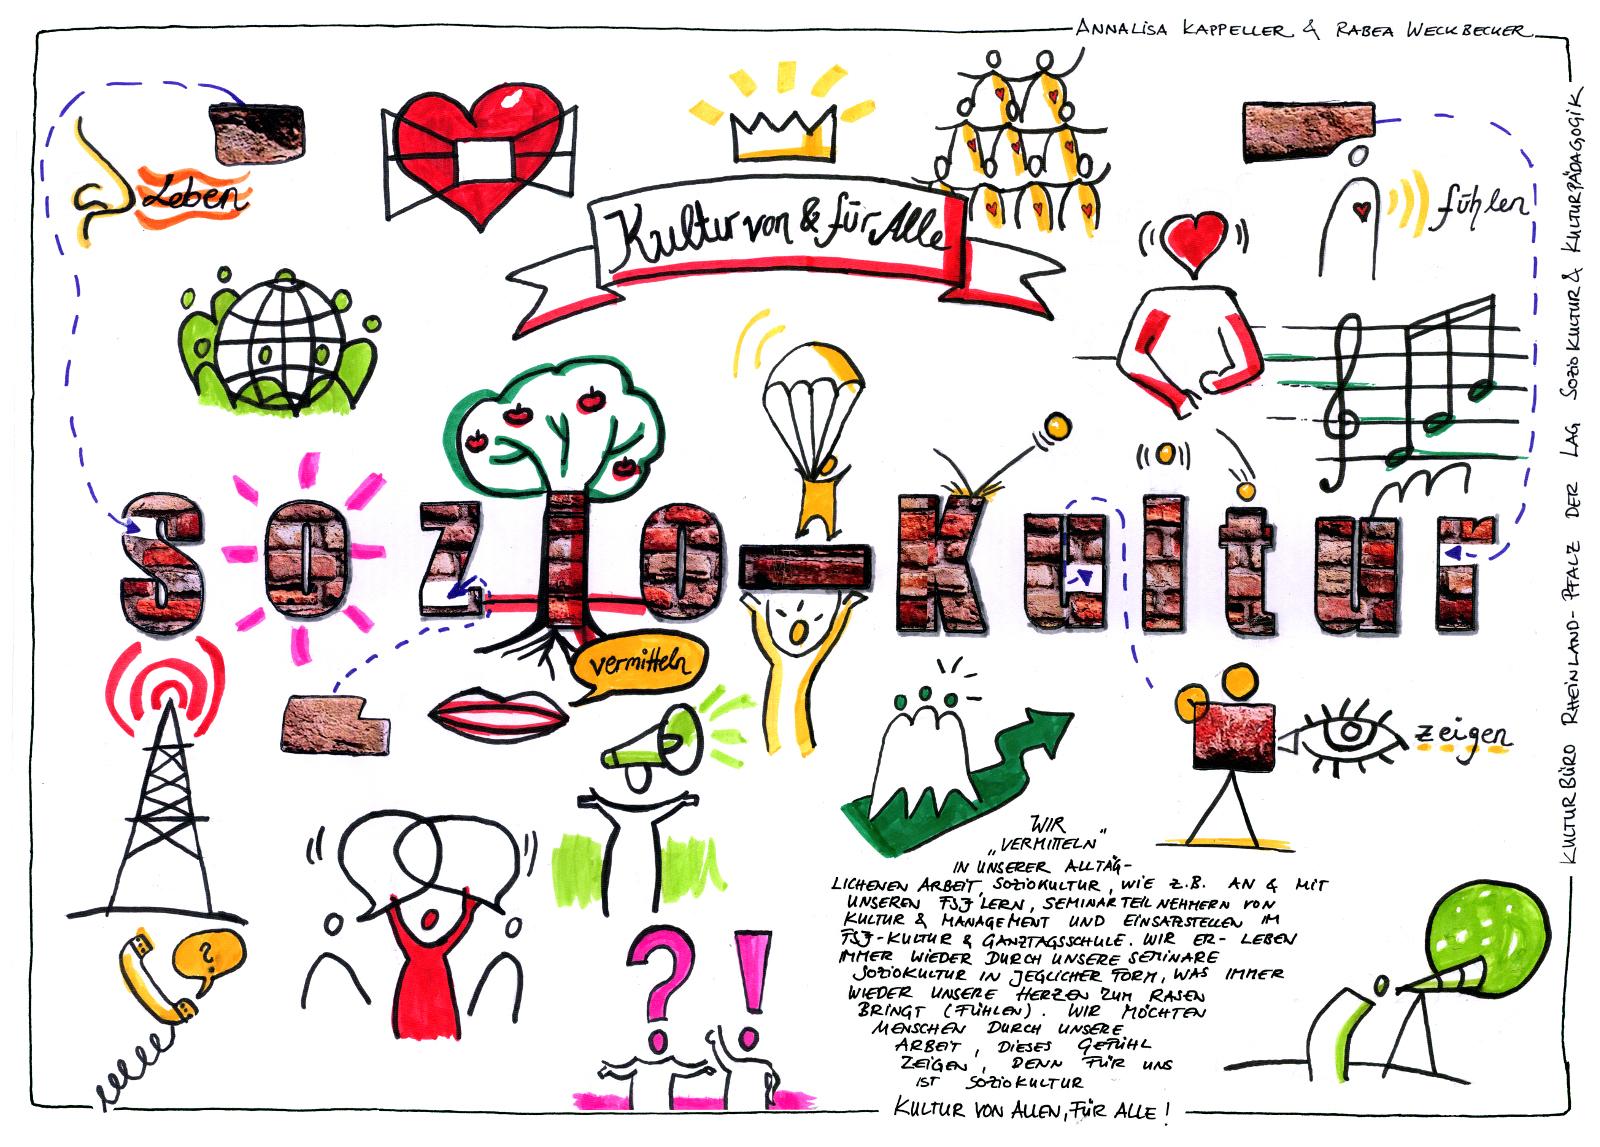 soziokultur-Kulturbüro Rheinland-Pfalz